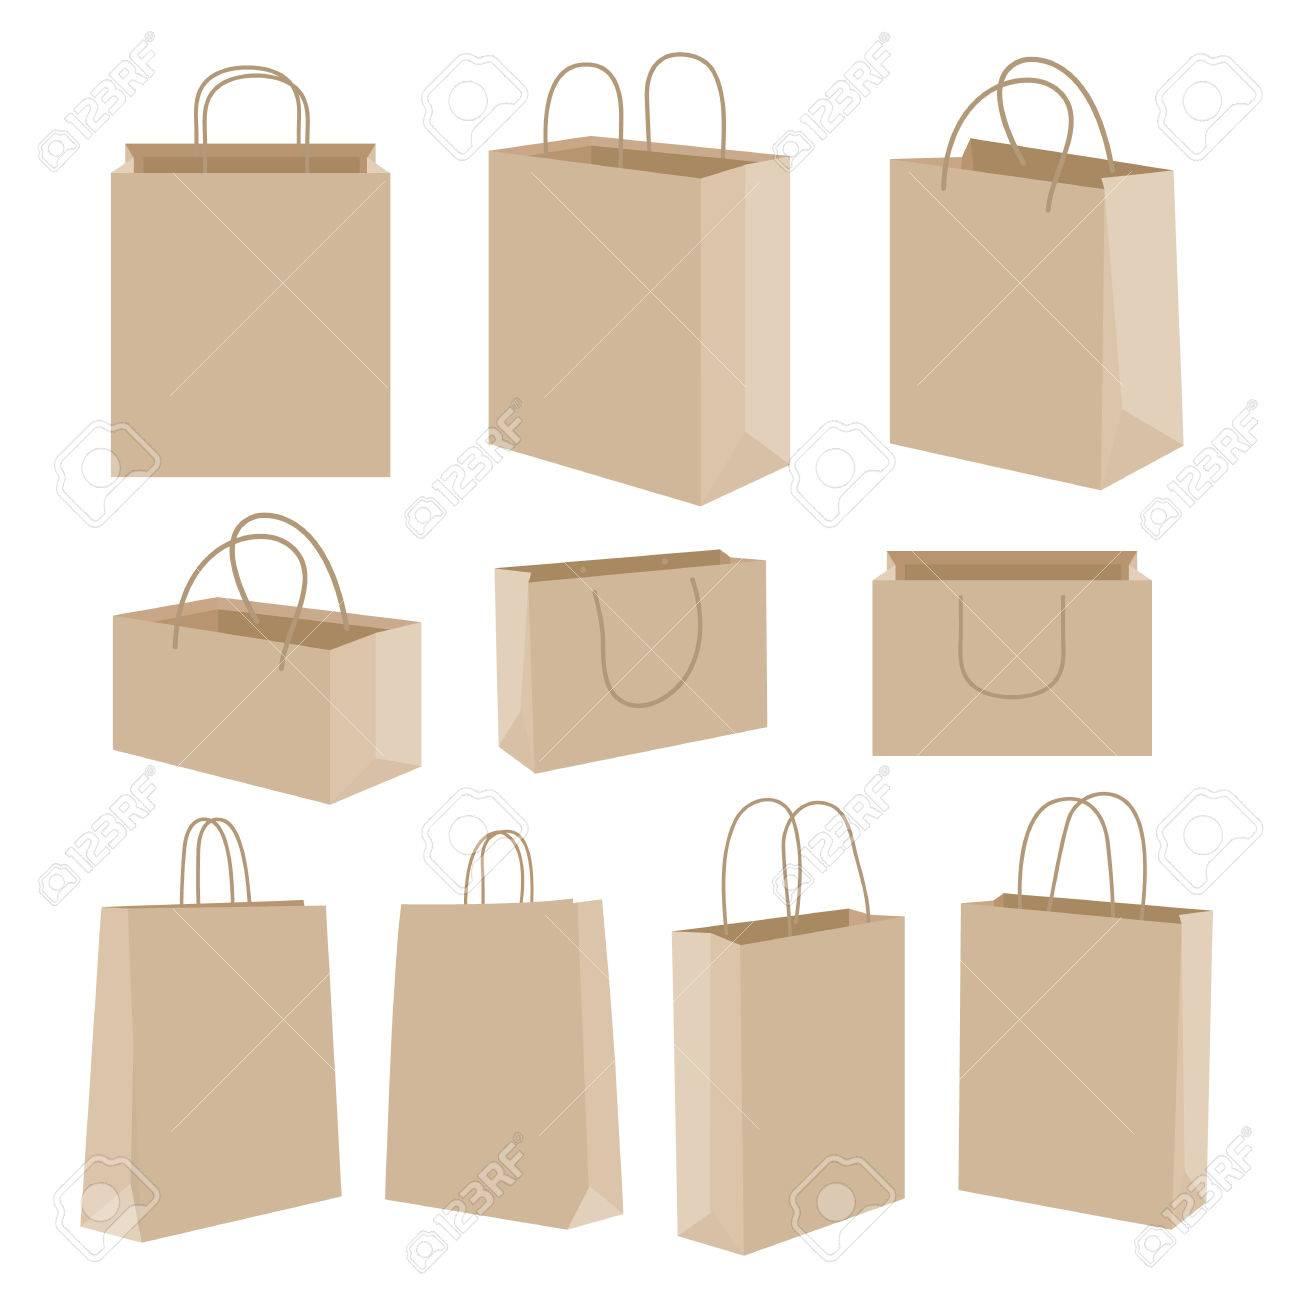 Paper bag vector - Paper Bag Vector Stock Vector 38392612